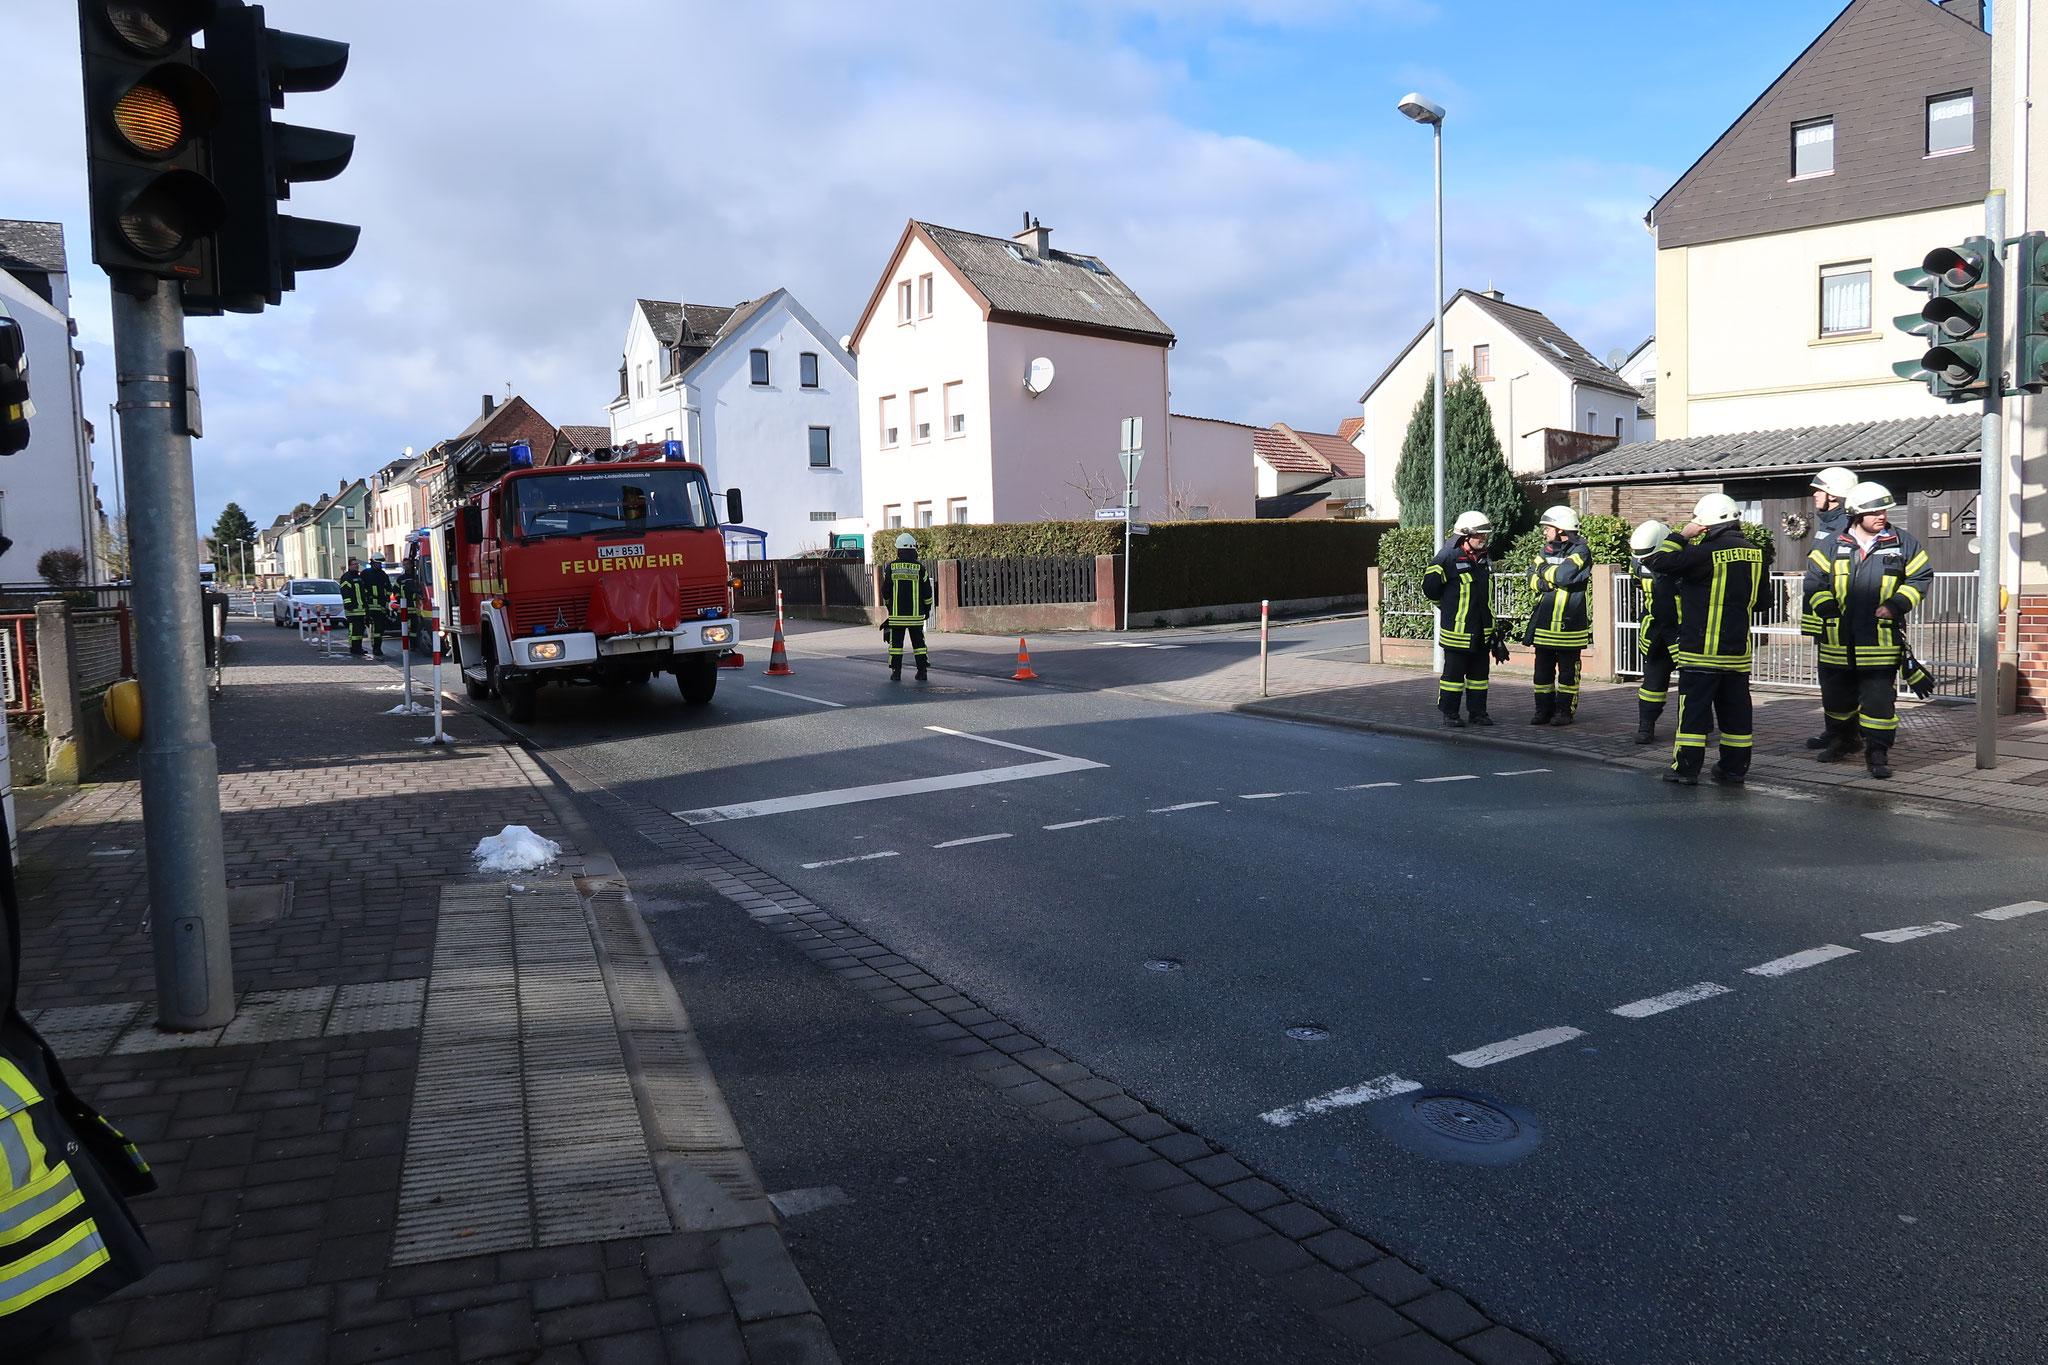 Kaminbrand, Lindenholzhausen, Frankfurter Straße